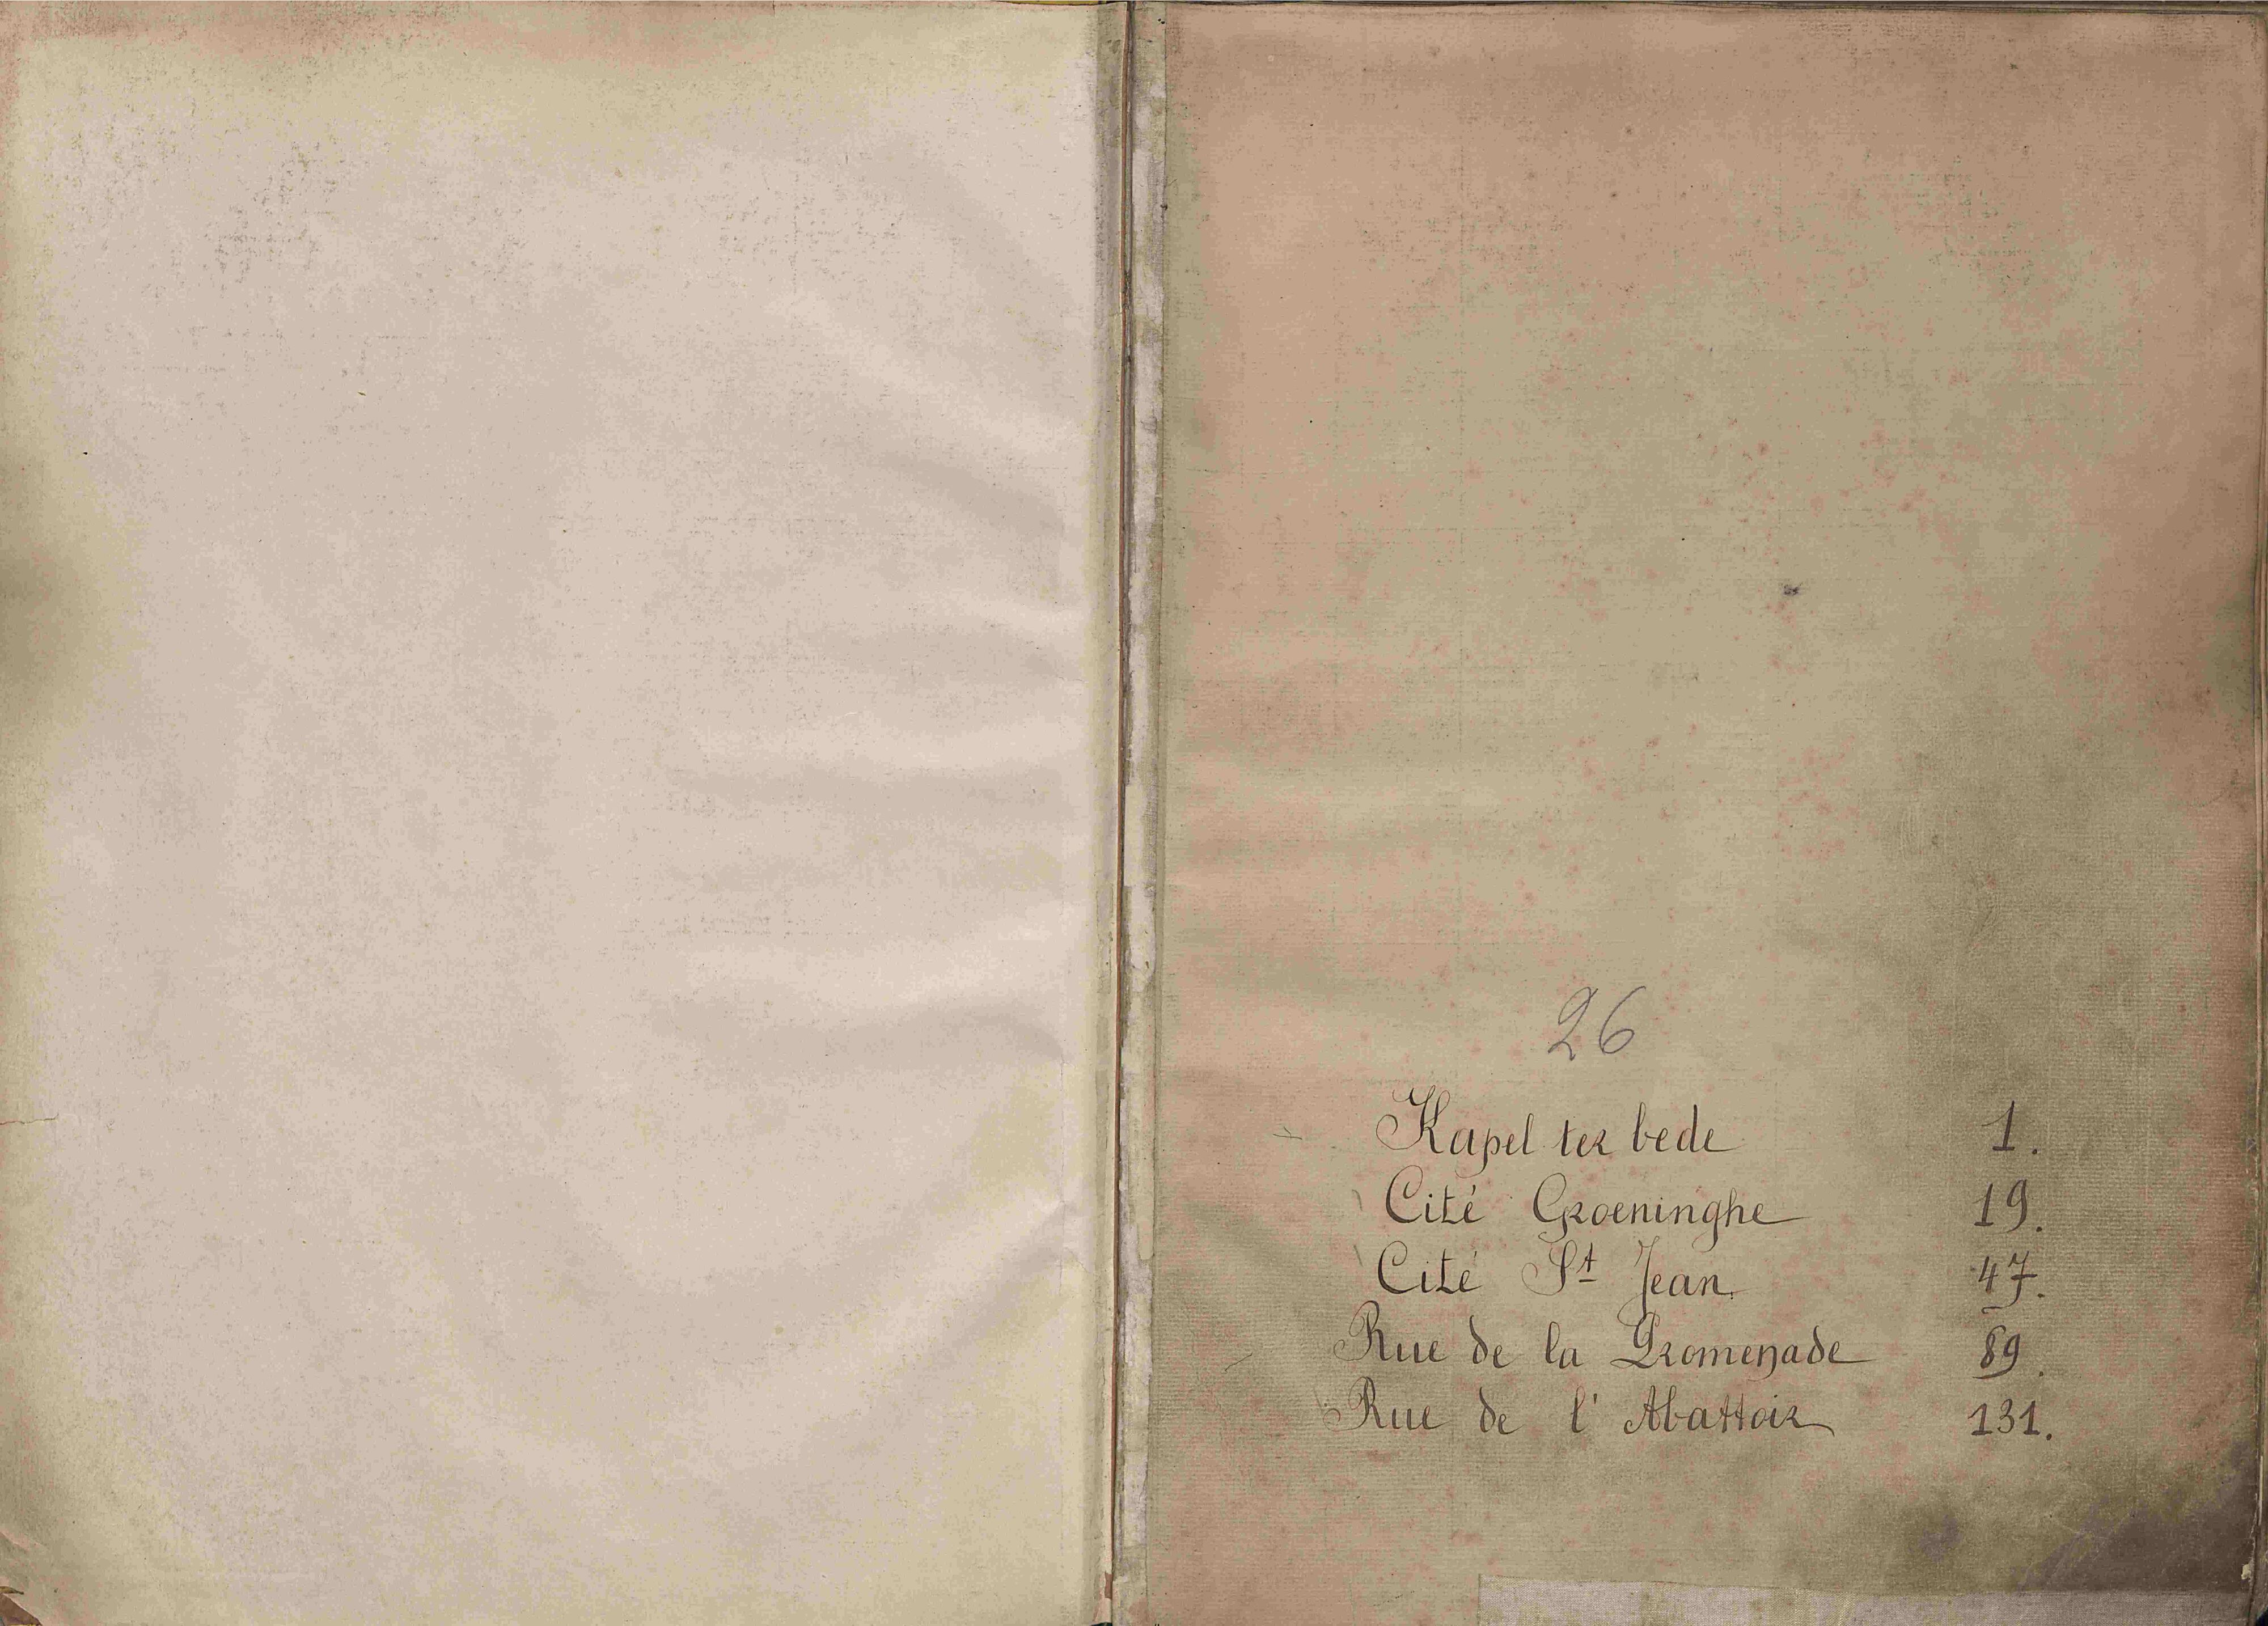 Bevolkingsregister Kortrijk 1890 boek 26